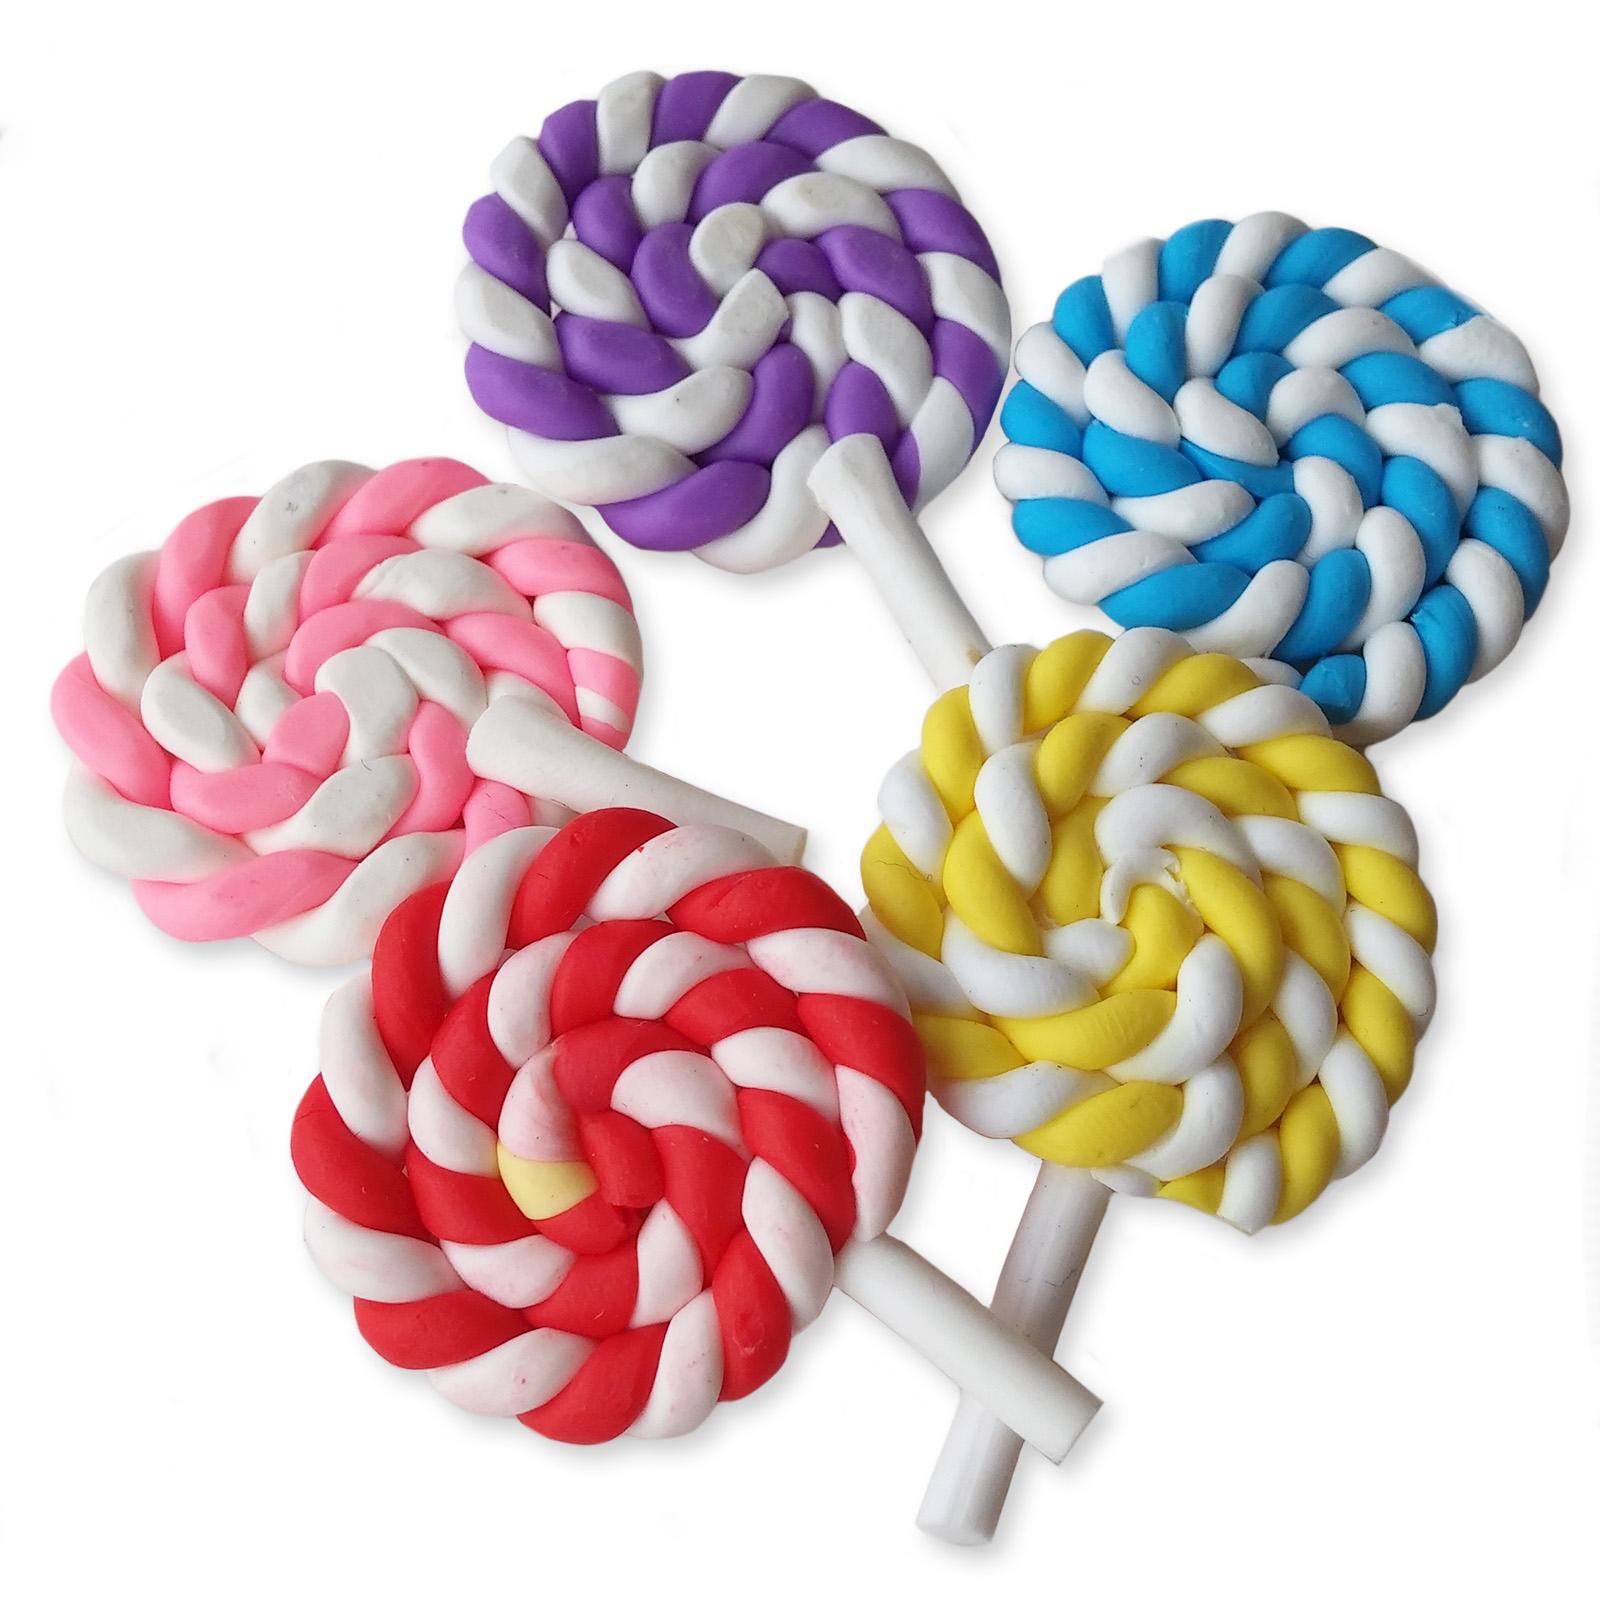 5pcs Clay Lolly Pop Candy Sweet Flatback Cabochon Embellishment